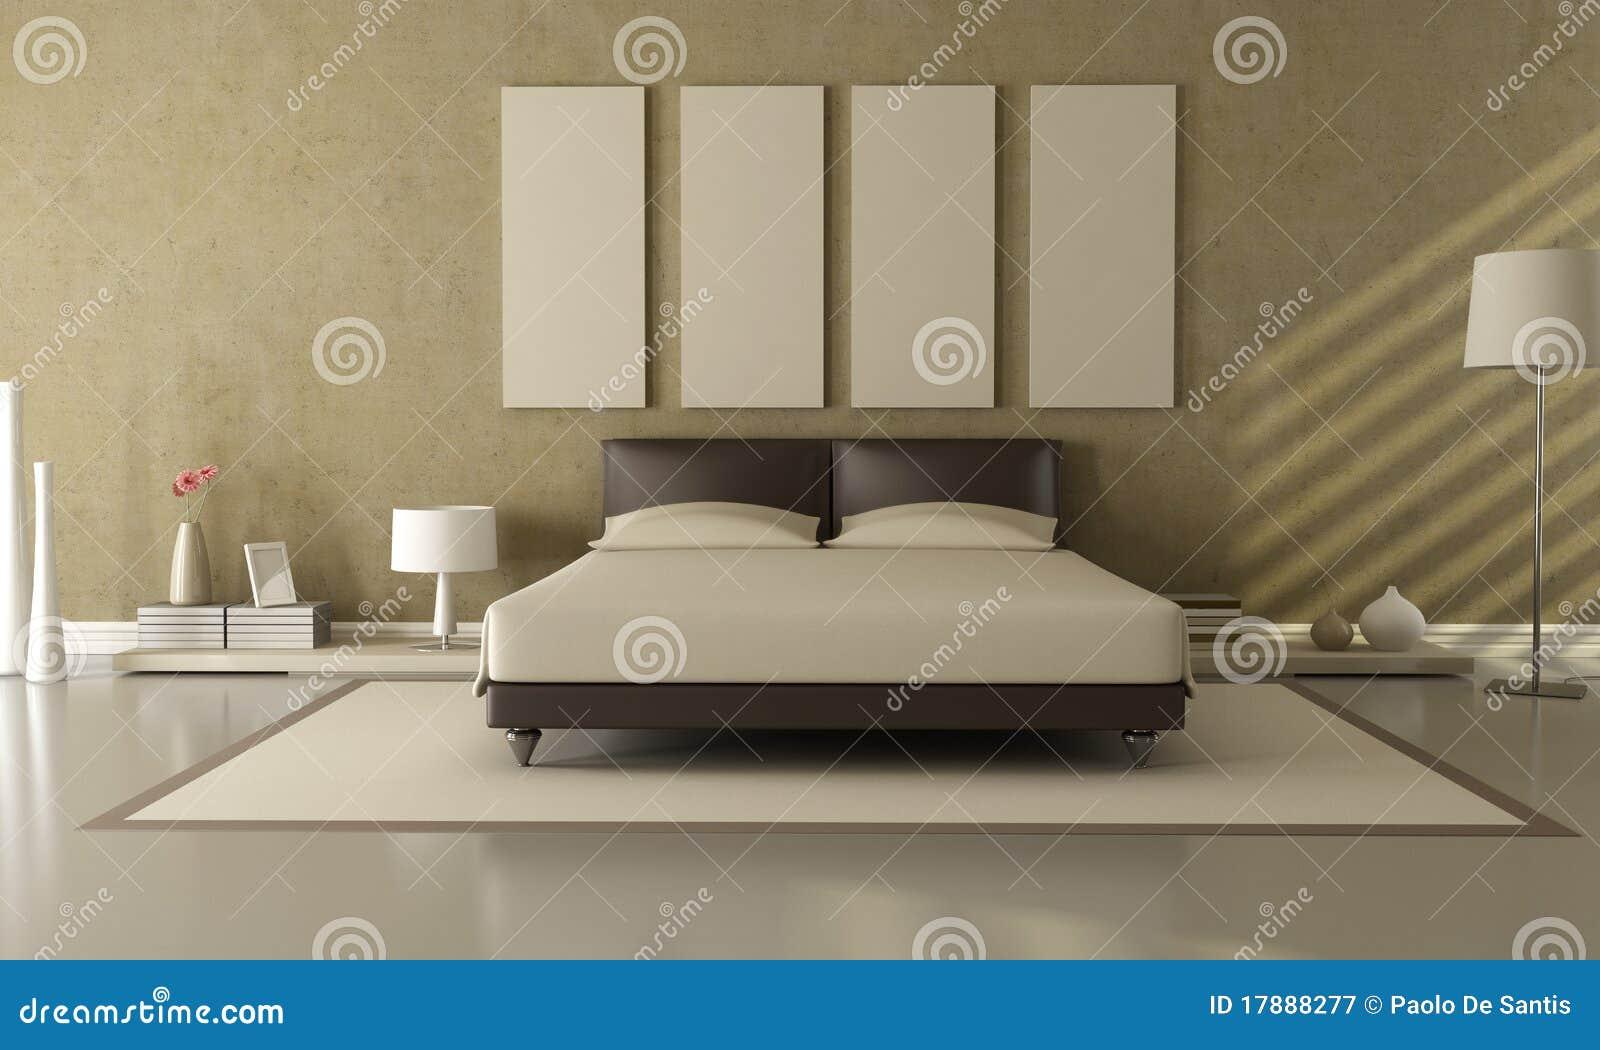 https://thumbs.dreamstime.com/z/bruine-en-beige-slaapkamer-17888277.jpg